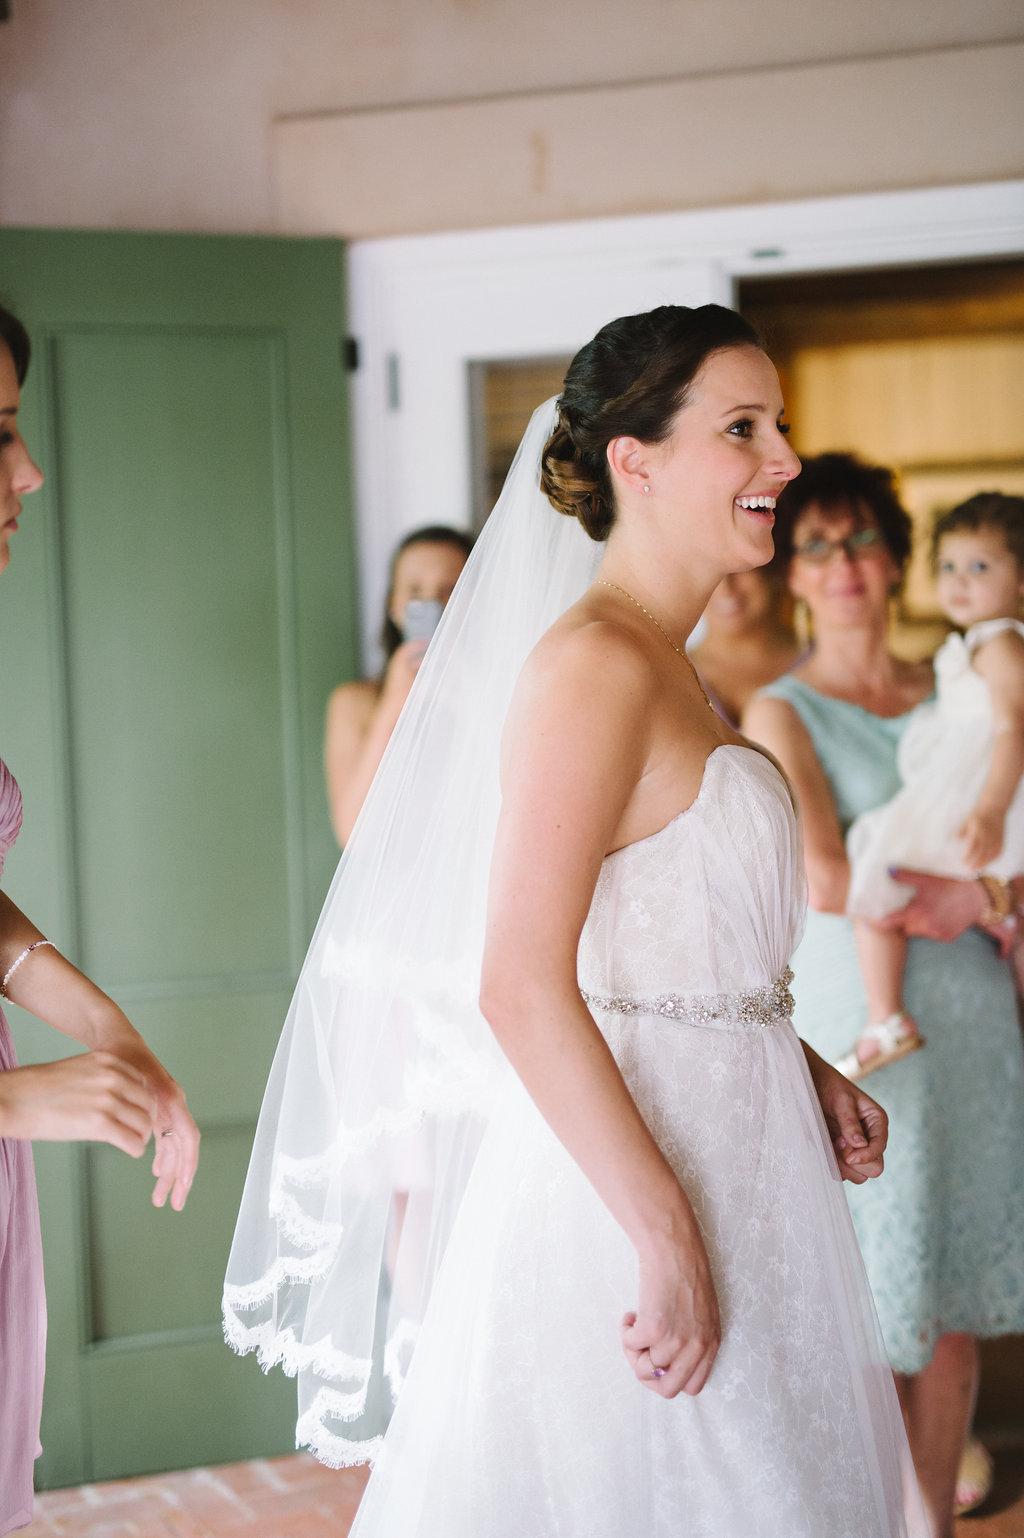 meagan-and-brenden-rach-loves-troy-photography-ivory-and-beau-bridal-boutqiue-ti-adora-wedding-dress-gold-lace-wedding-dress-savannah-wedding-planner-savannah-weddings-oldfield-plantation-wedding-savannah-florist-12.jpg